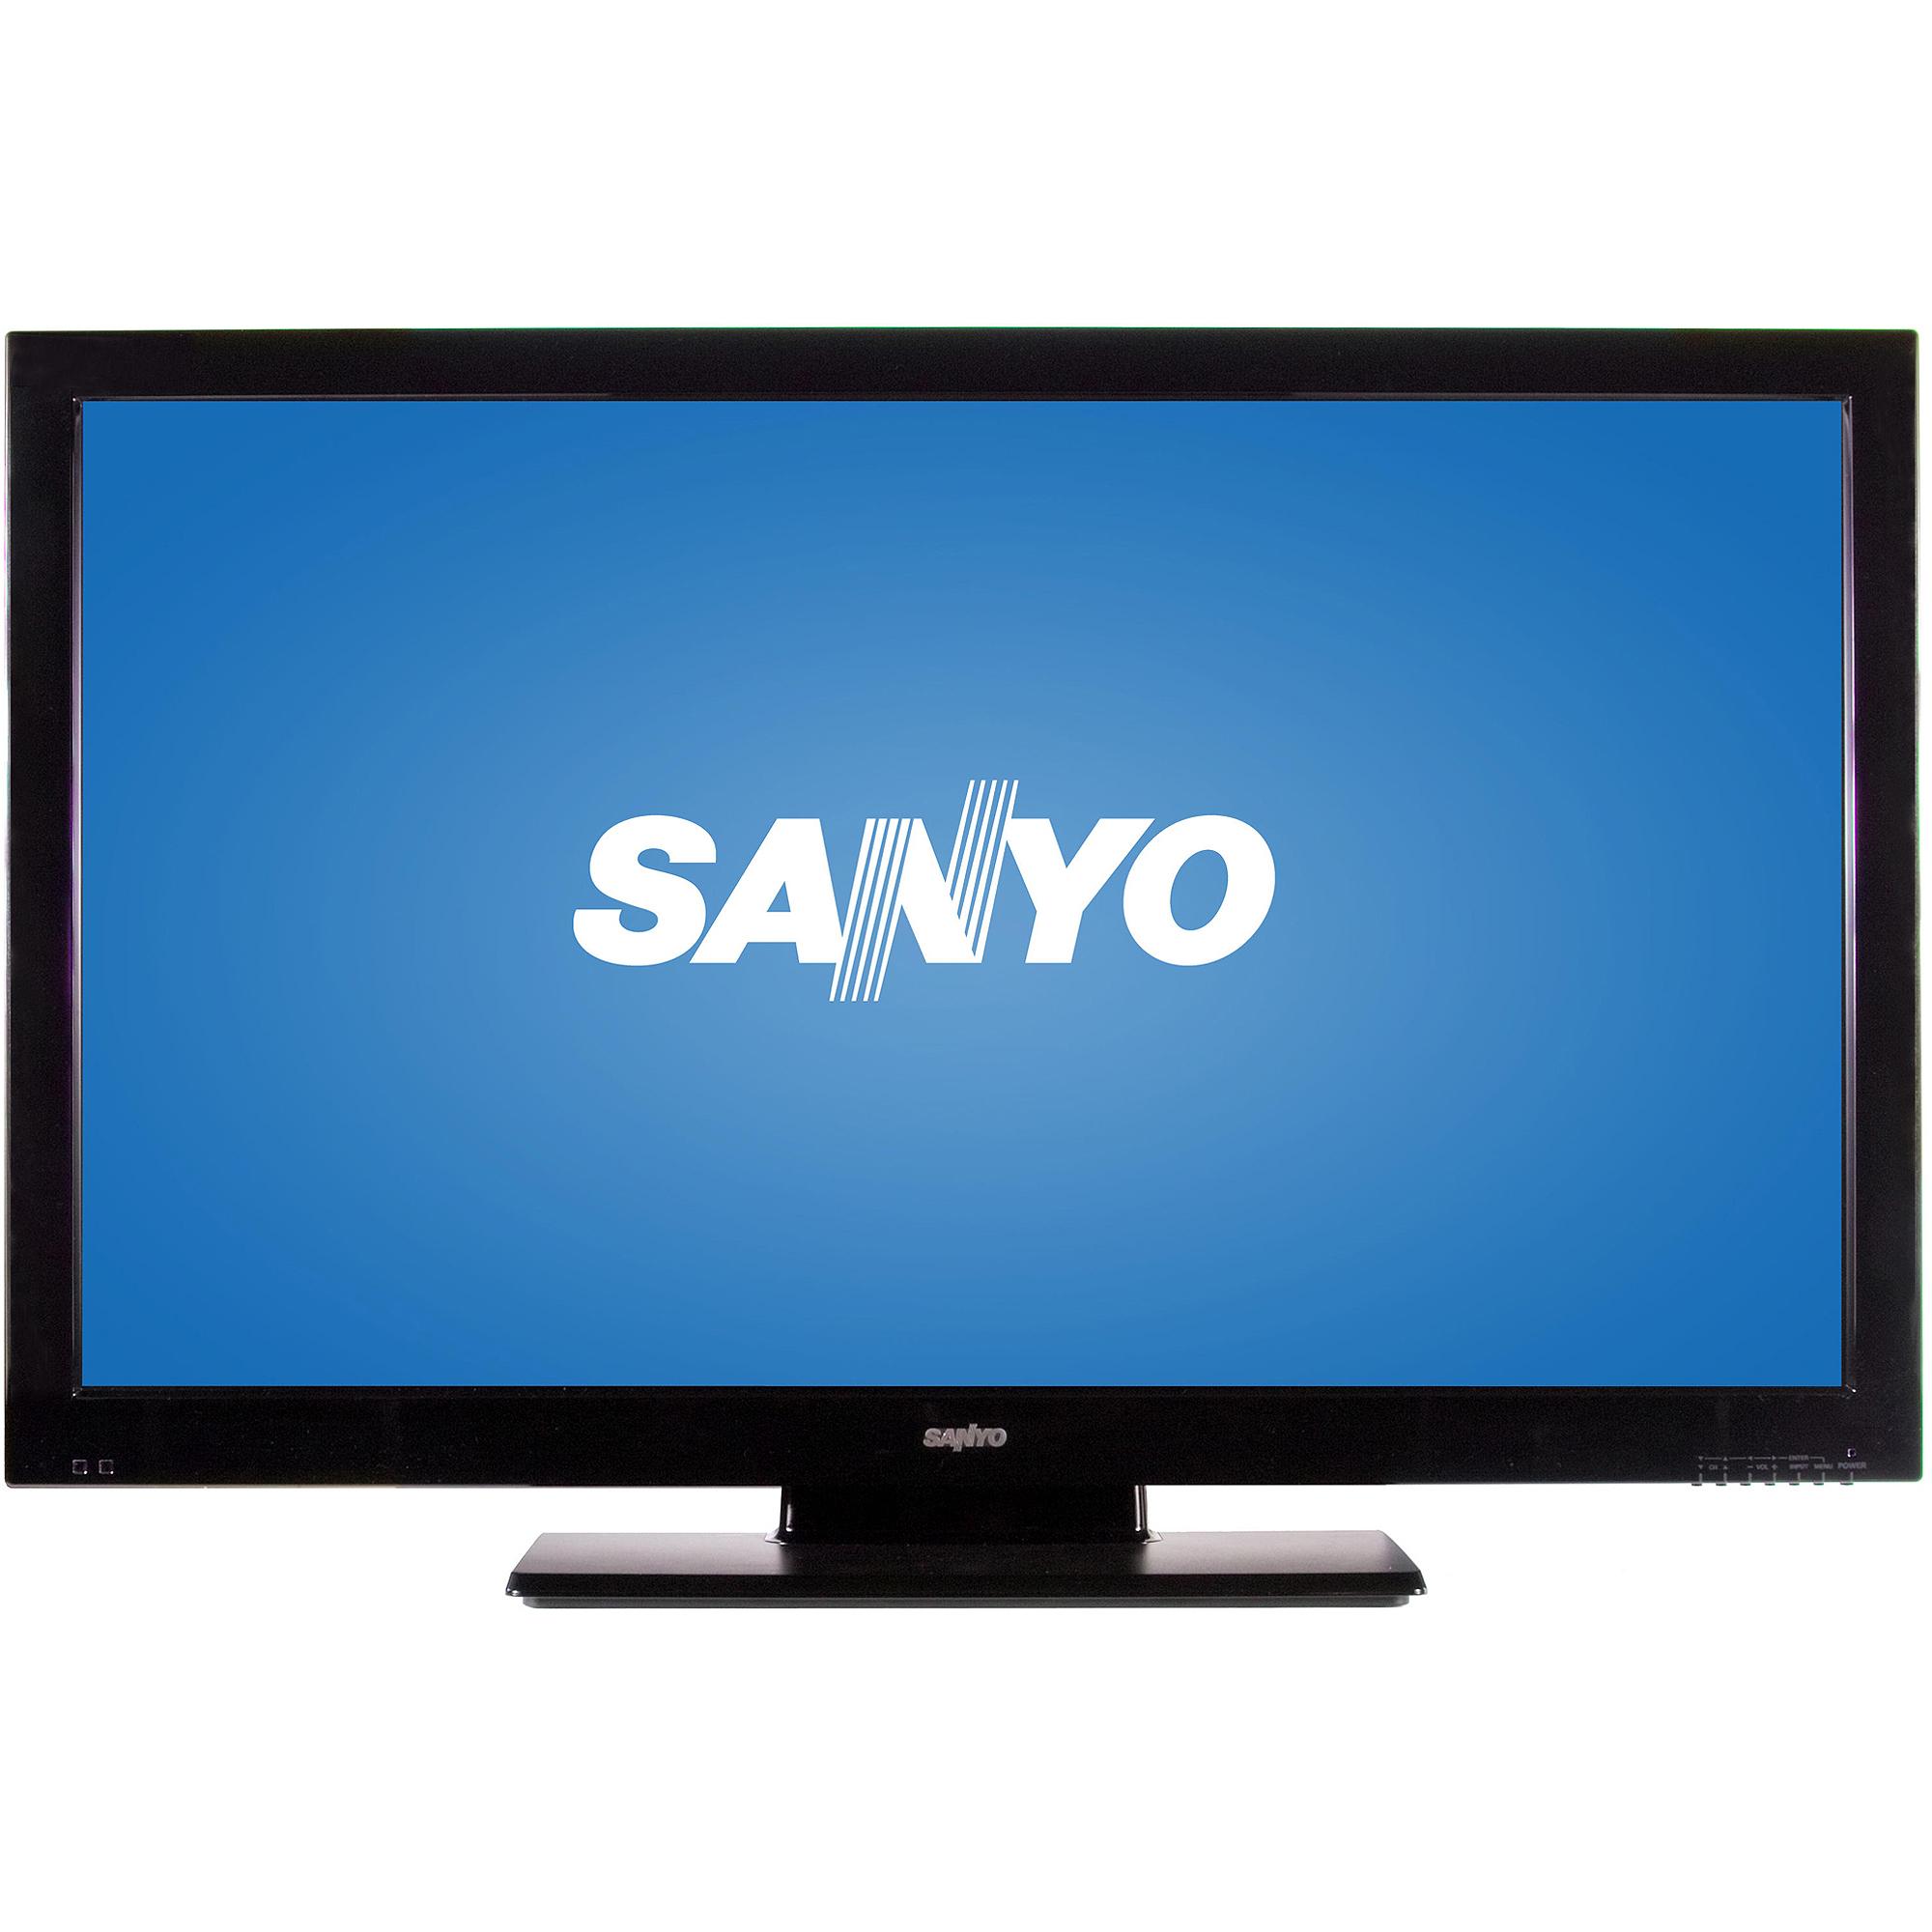 Sanyo Dp42841 42 Quot Class Lcd 1080p 60hz Hdtv Refurbished